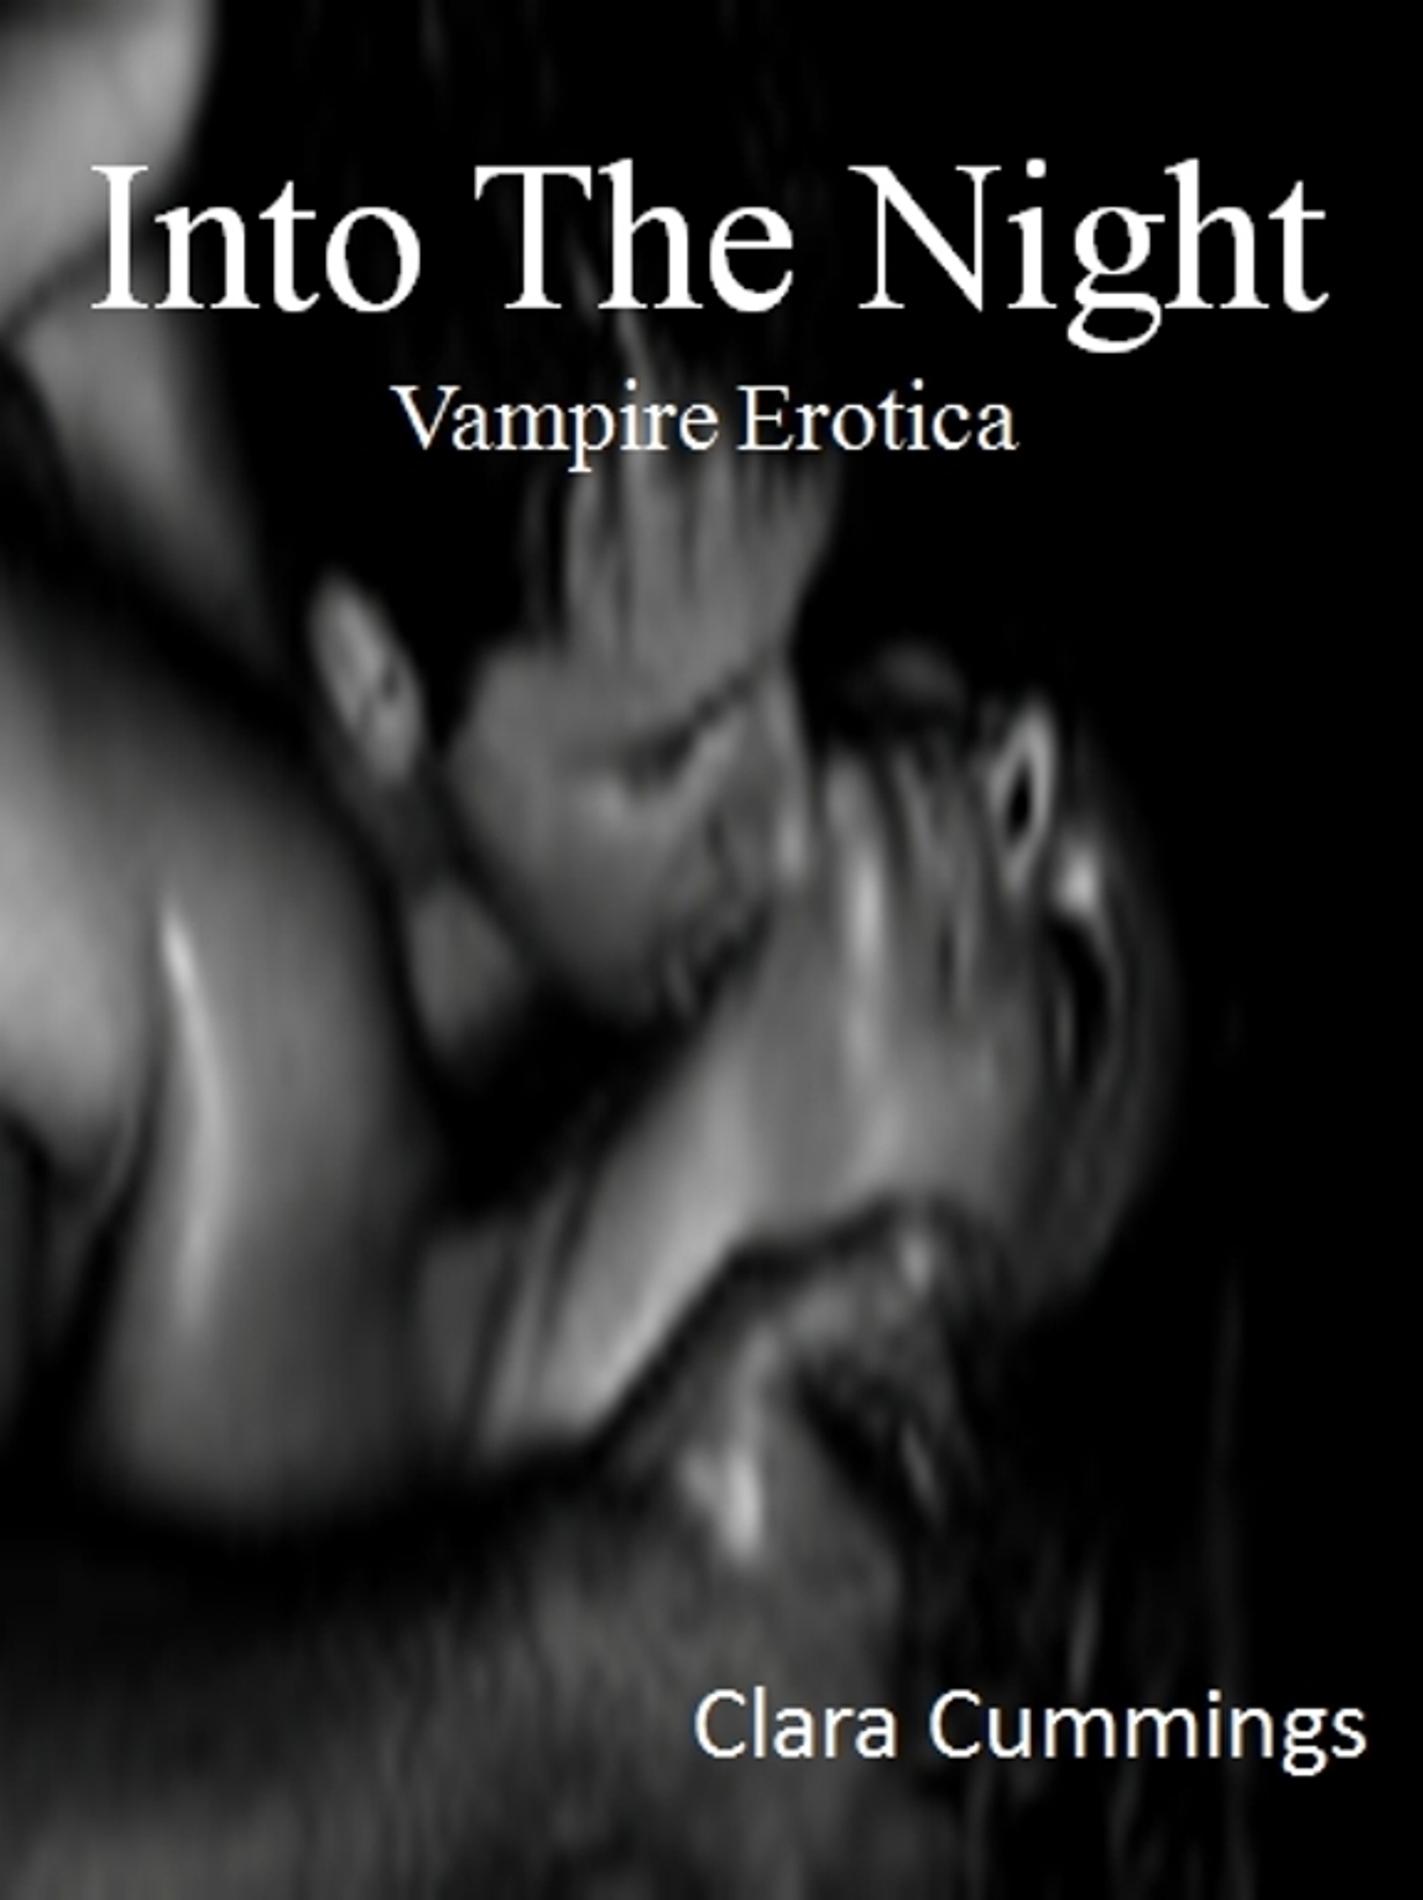 Vampire erotica stories erotic comic